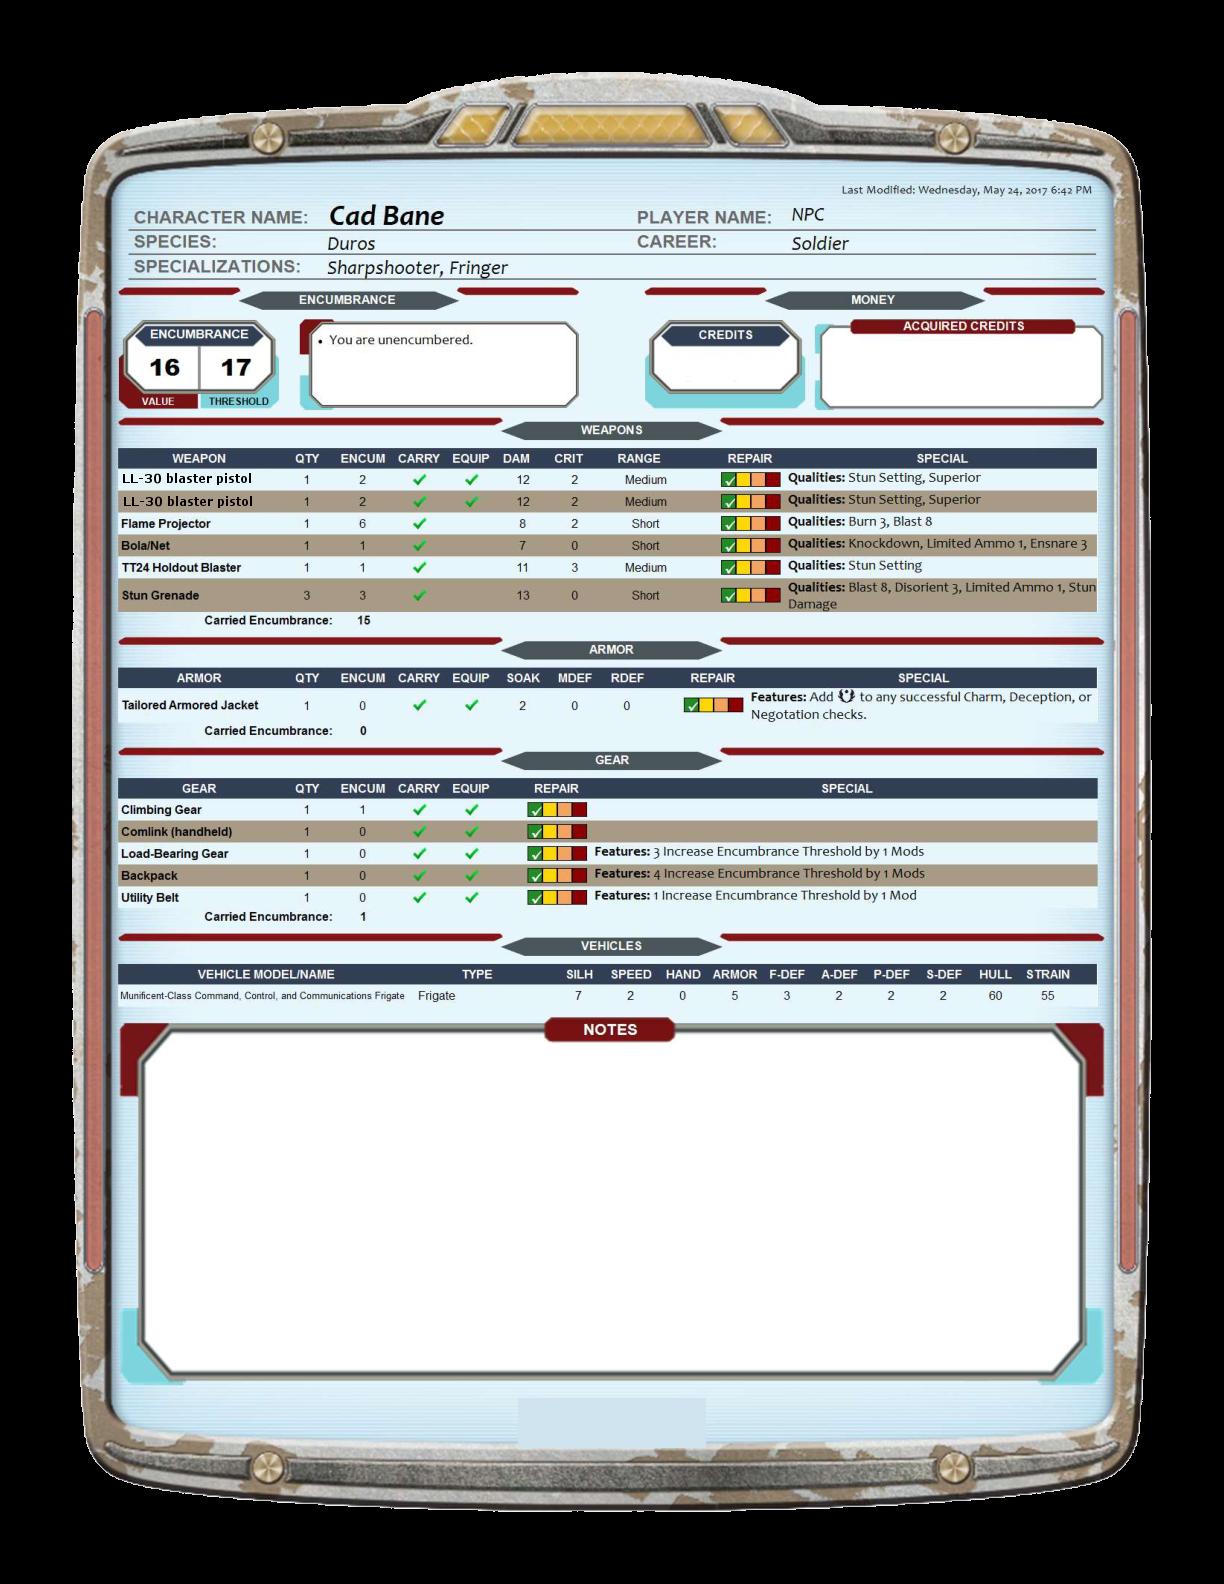 Cad_Bane_info_sheet_3.png